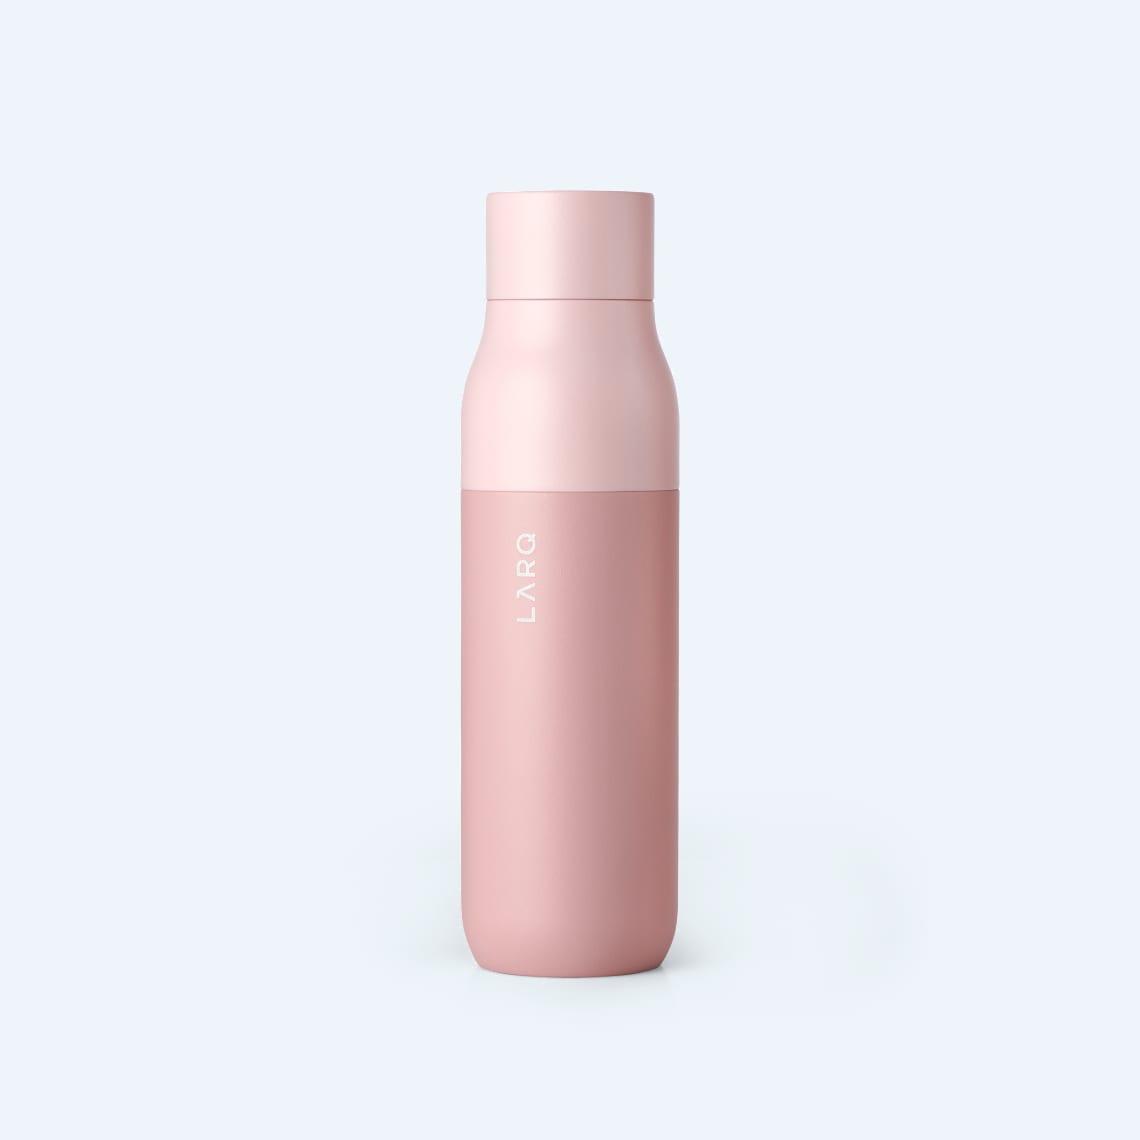 LARQ Bottle PureVis - Himalayan Pink 17 oz